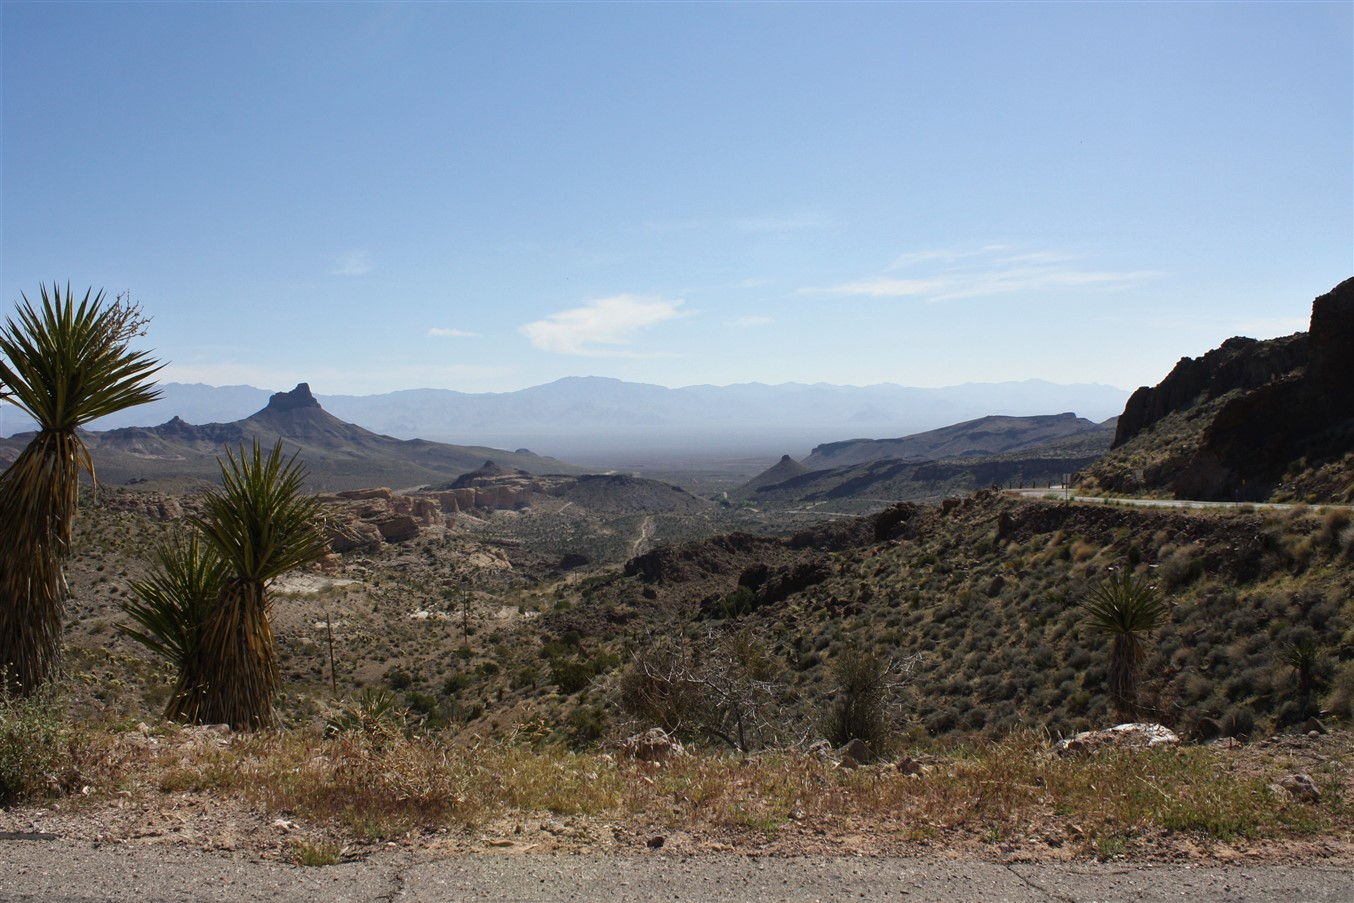 2012 03 14 Route 66 Road Trip 112 Oatman Highway Arizona.jpg